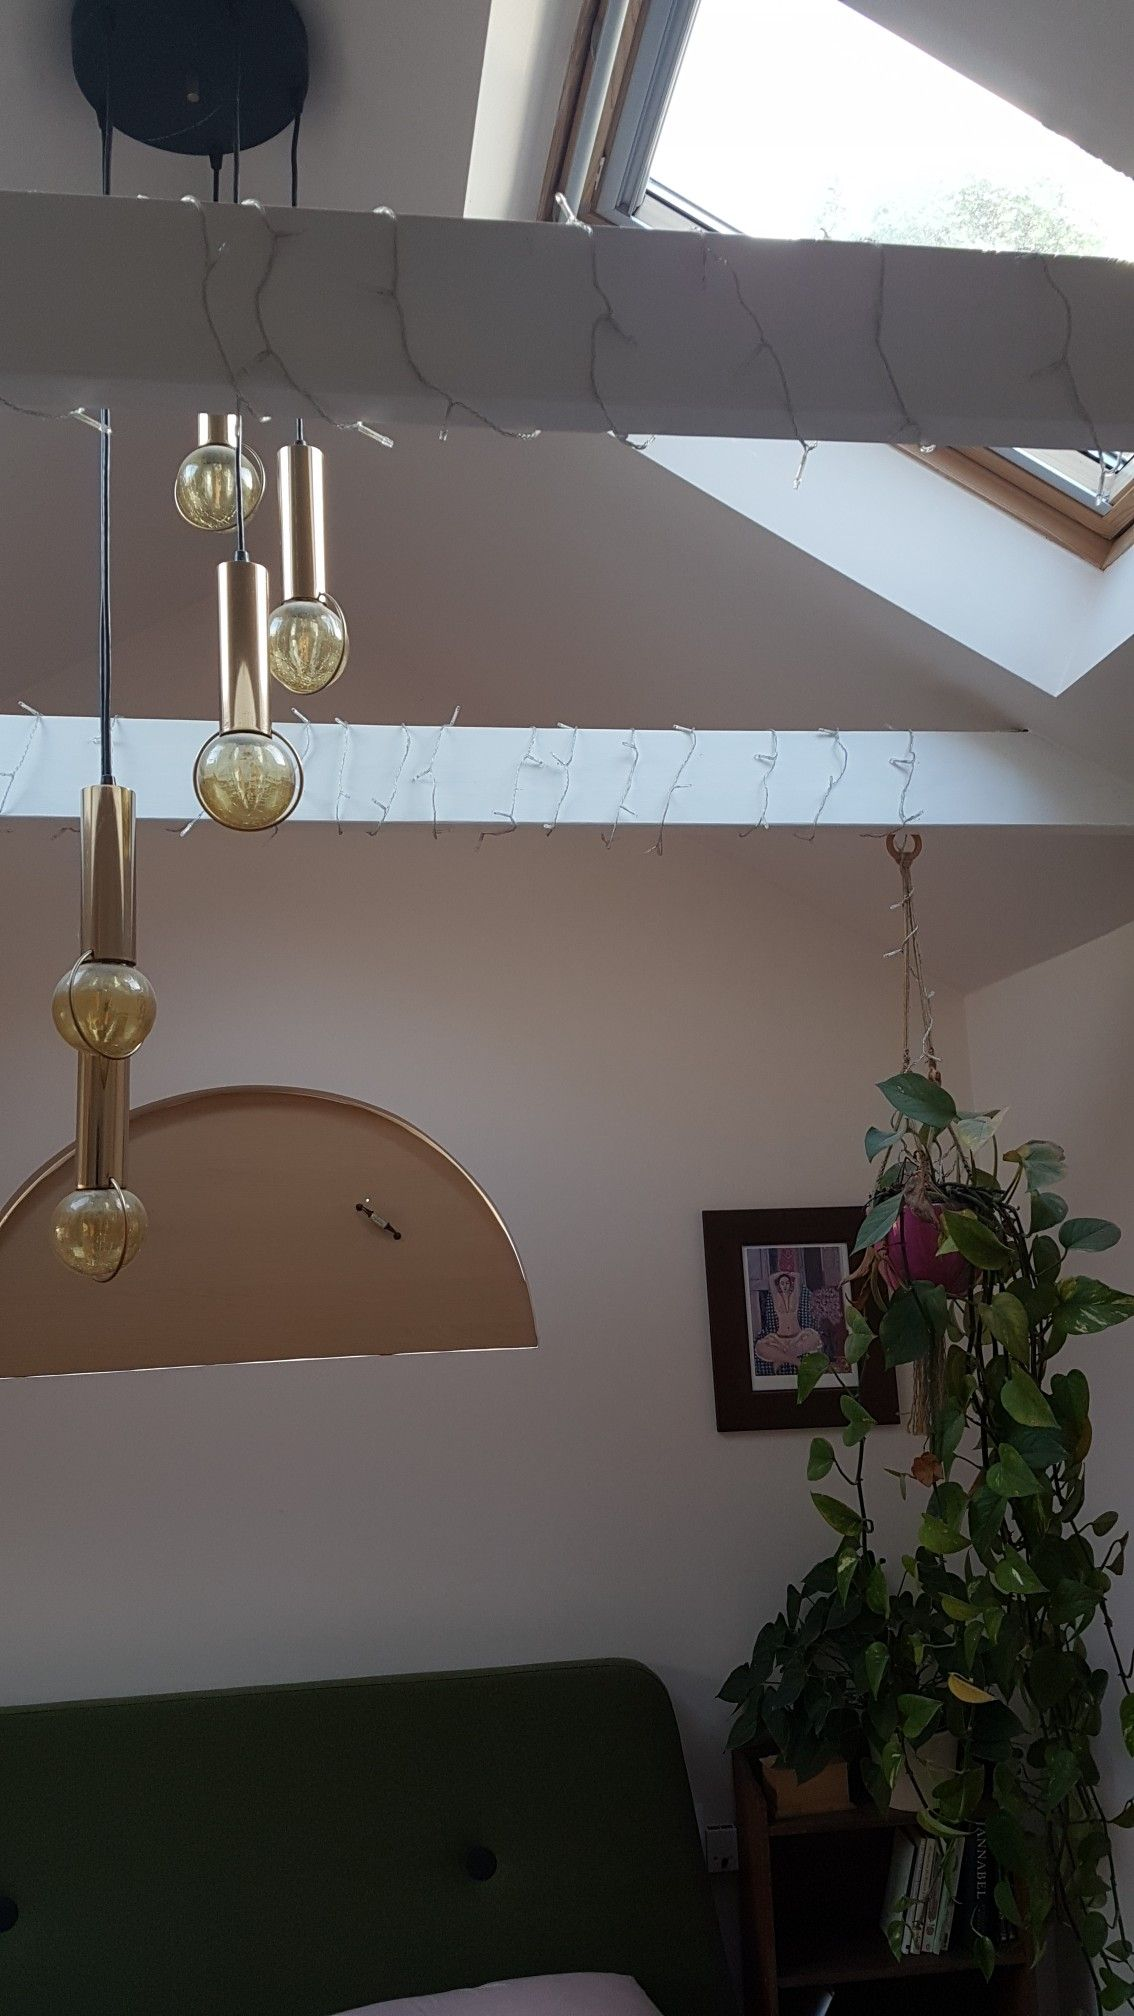 Loft Bedroom Beams Hanging Plant Arch Window